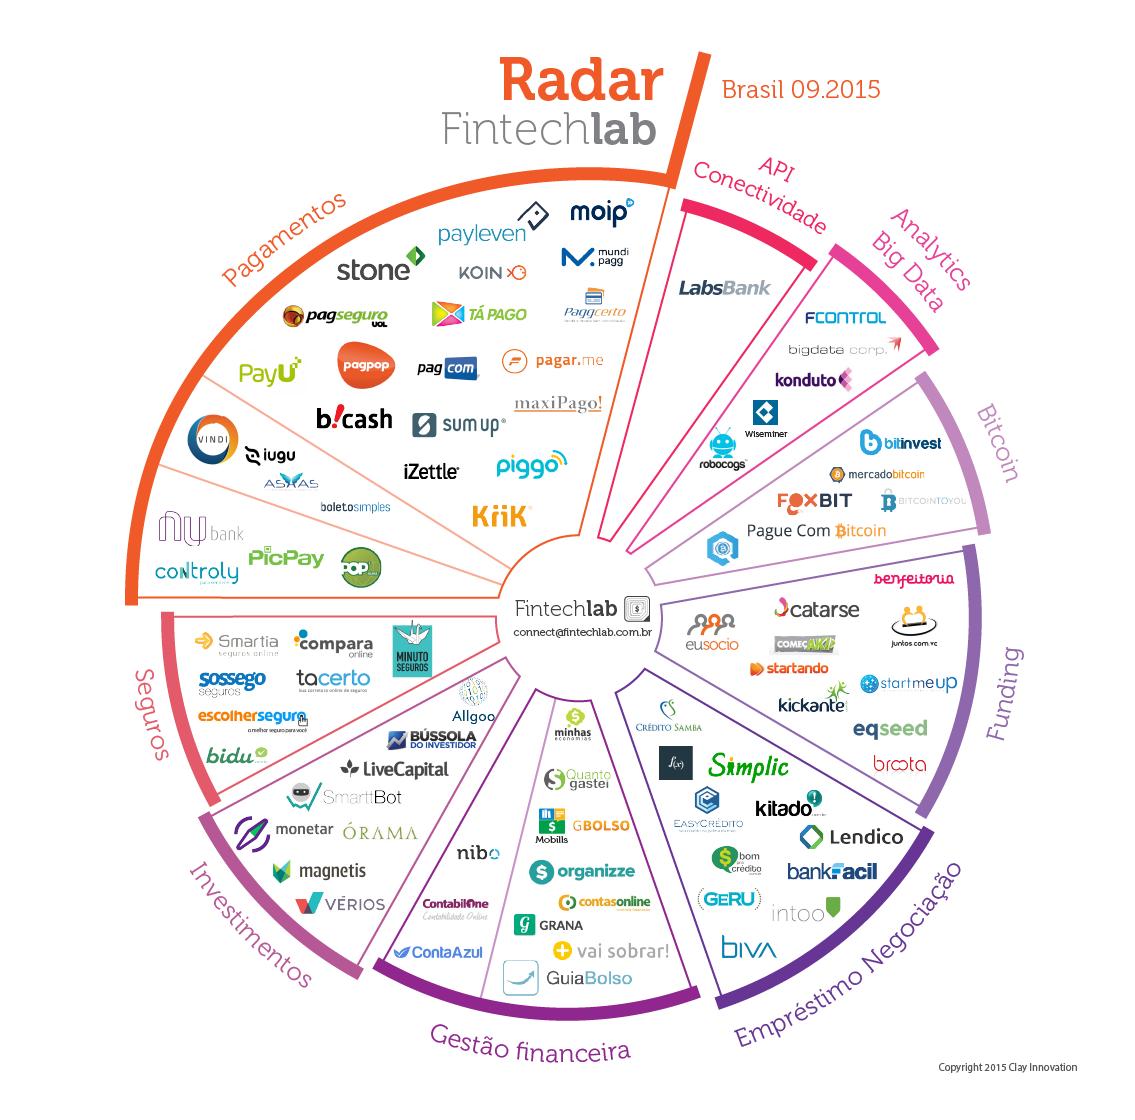 fintechlab radar